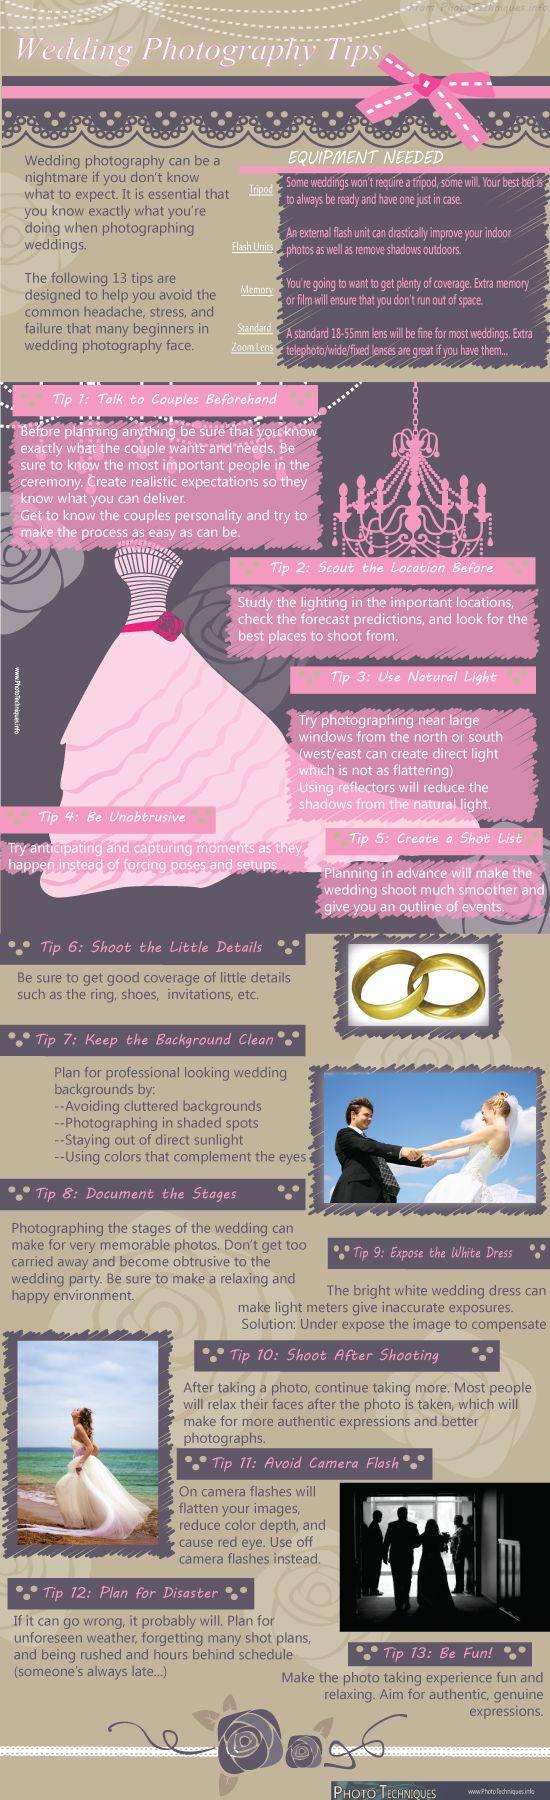 10 best Infographics images on Pinterest | Infographics, Best man ...